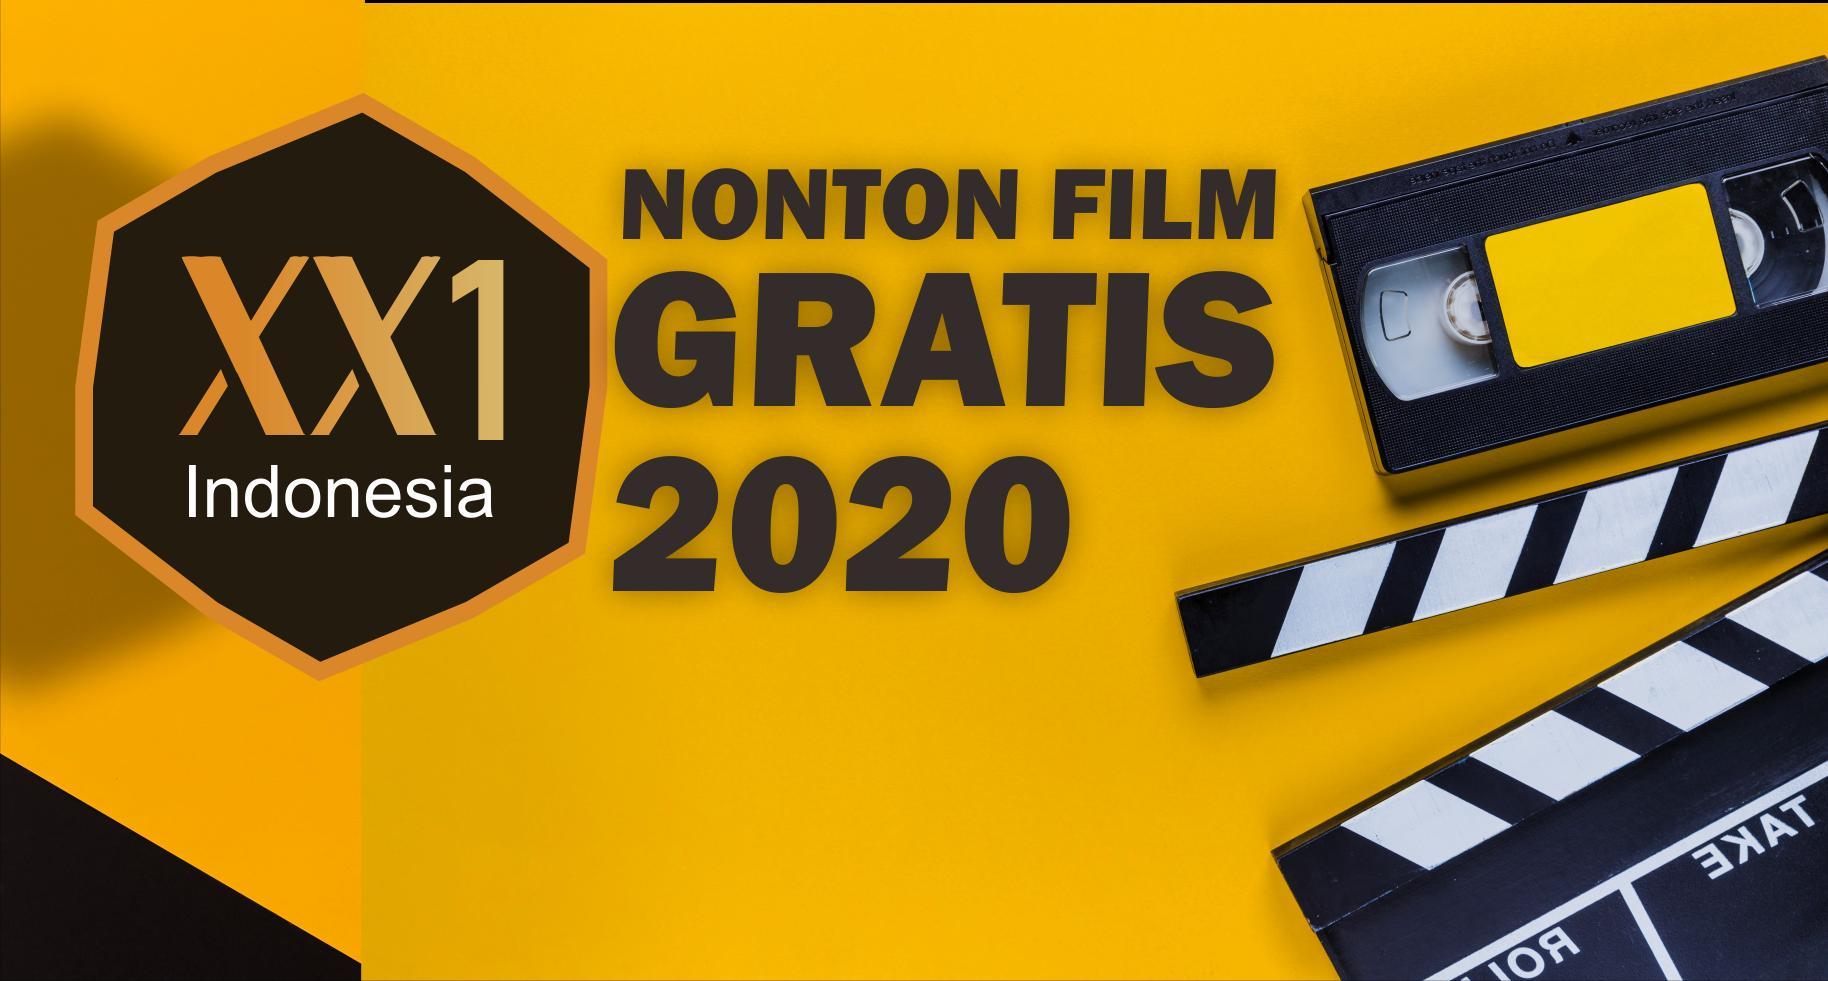 Film semi indoxxi terbaru 2020 indonesia